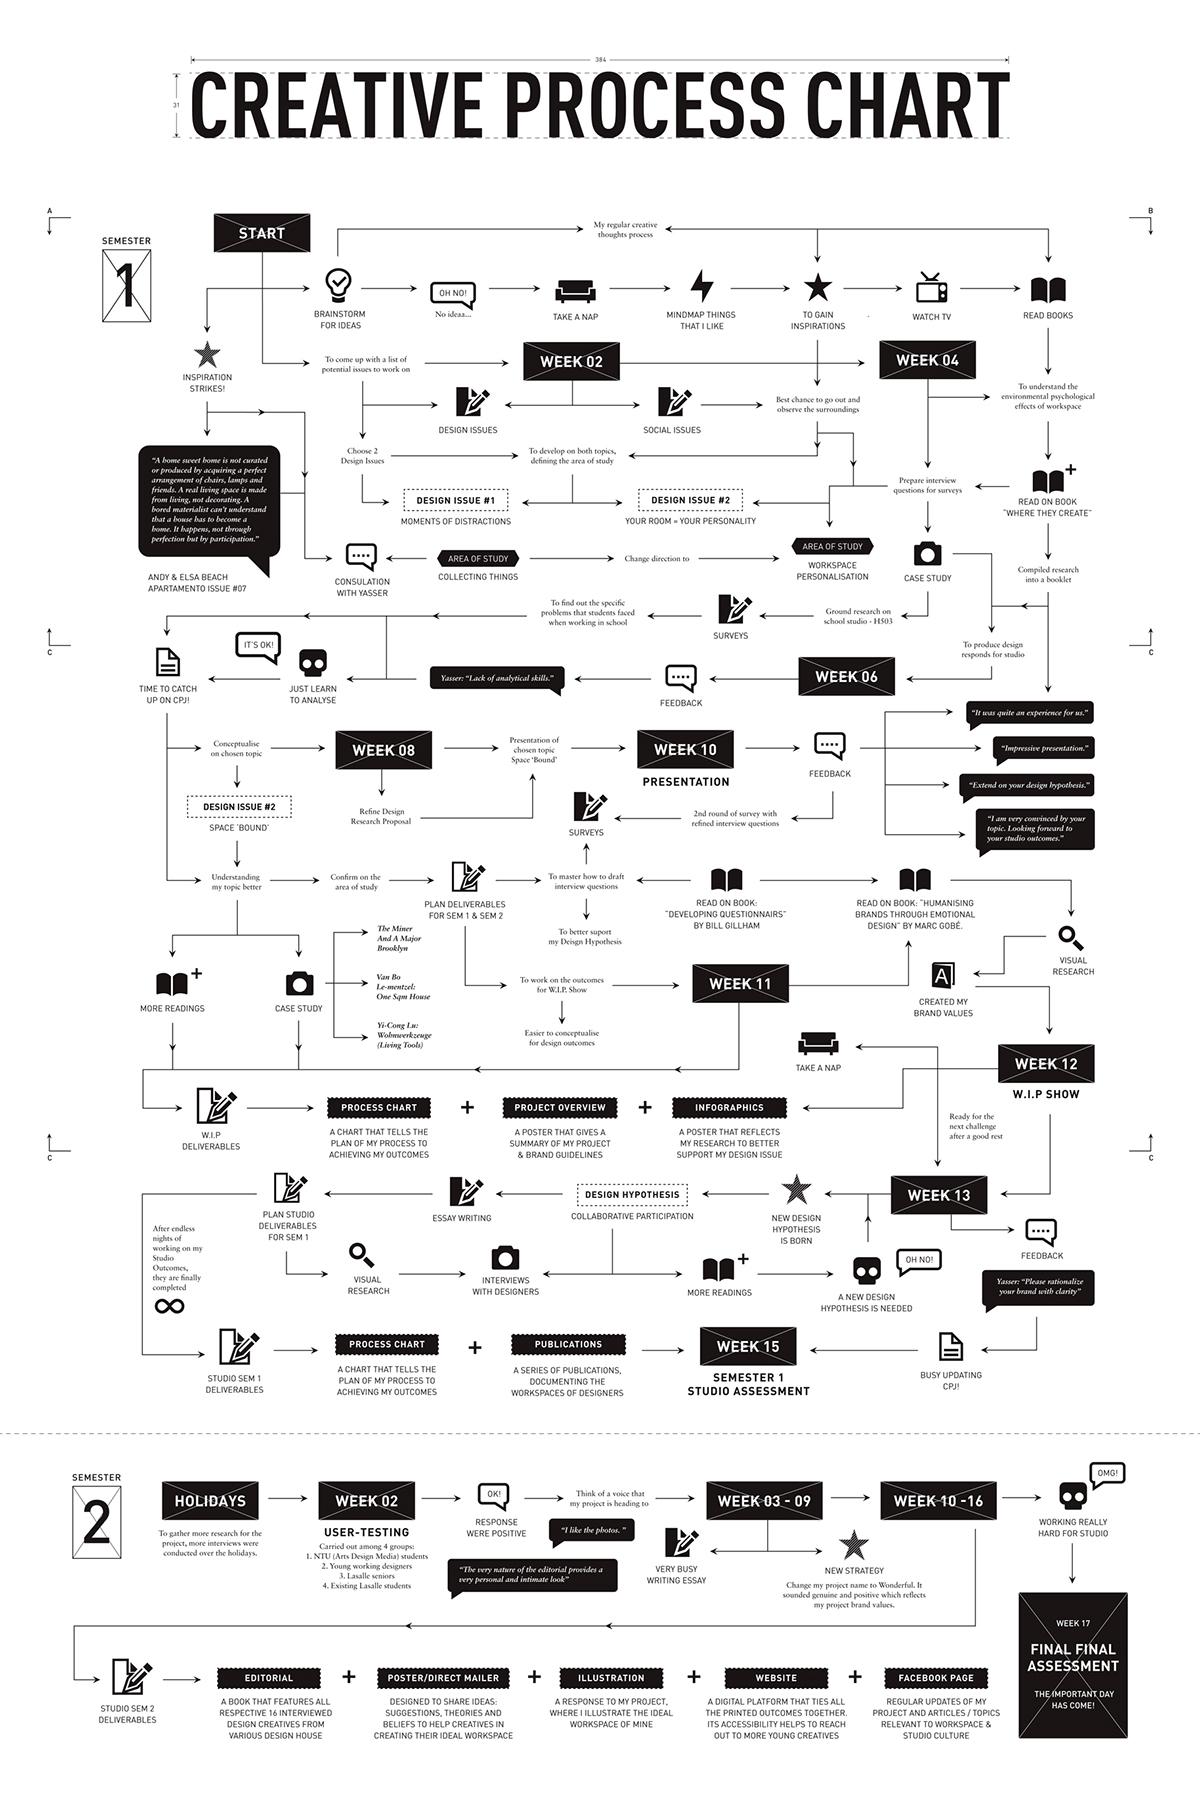 Wonderful Creative Process Chart On Behance